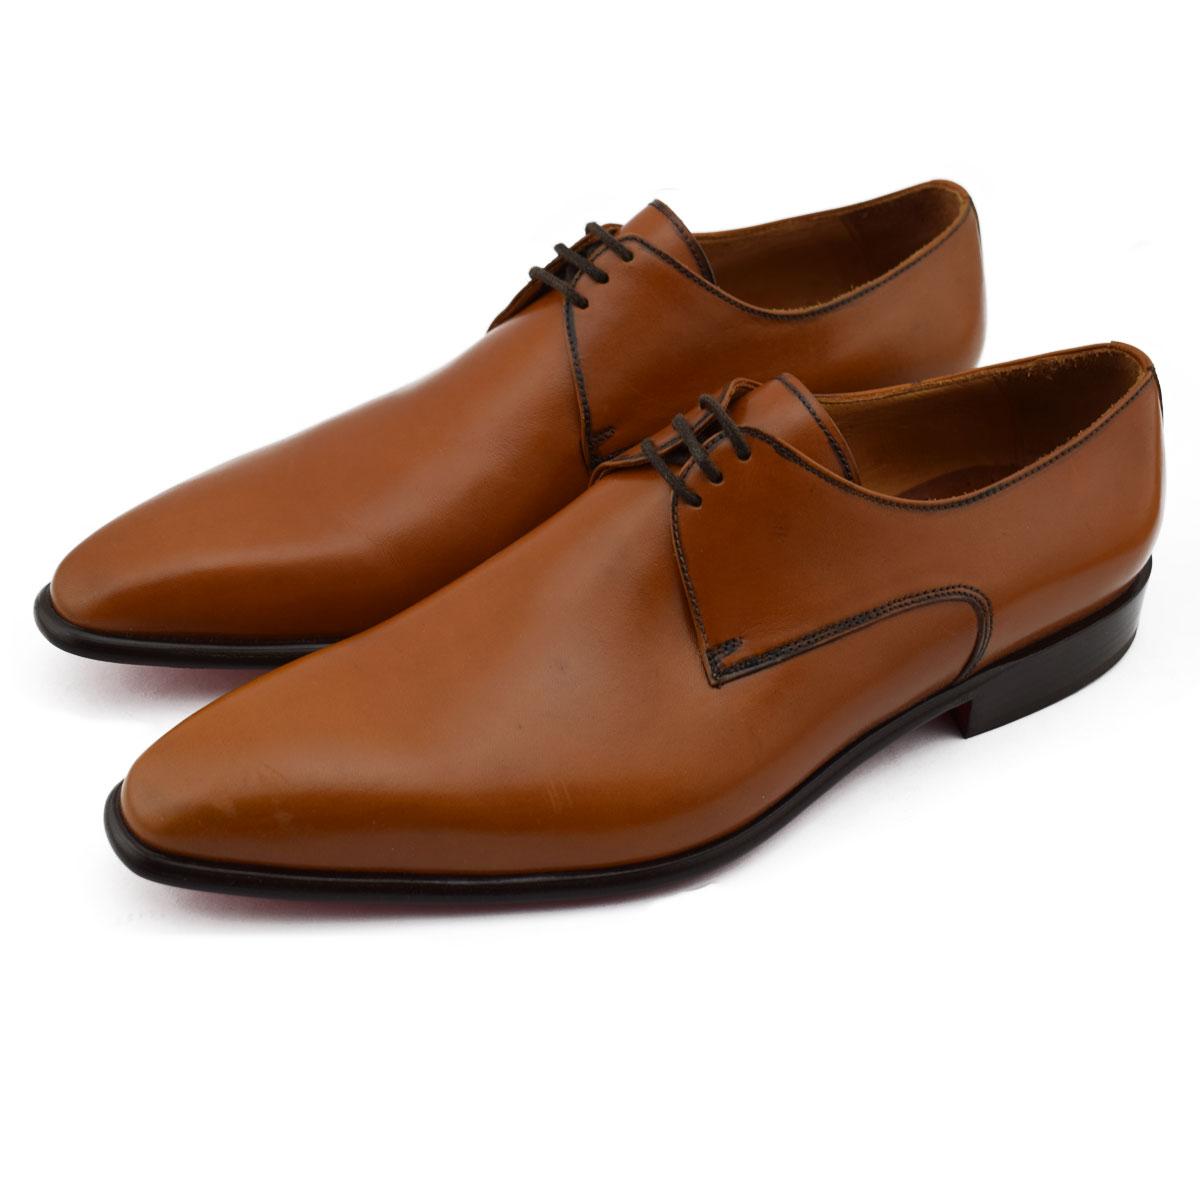 21e90a9c7cc zapatos-hombre-ofertas-sale-dino-butelli lightbox · lightbox · lightbox